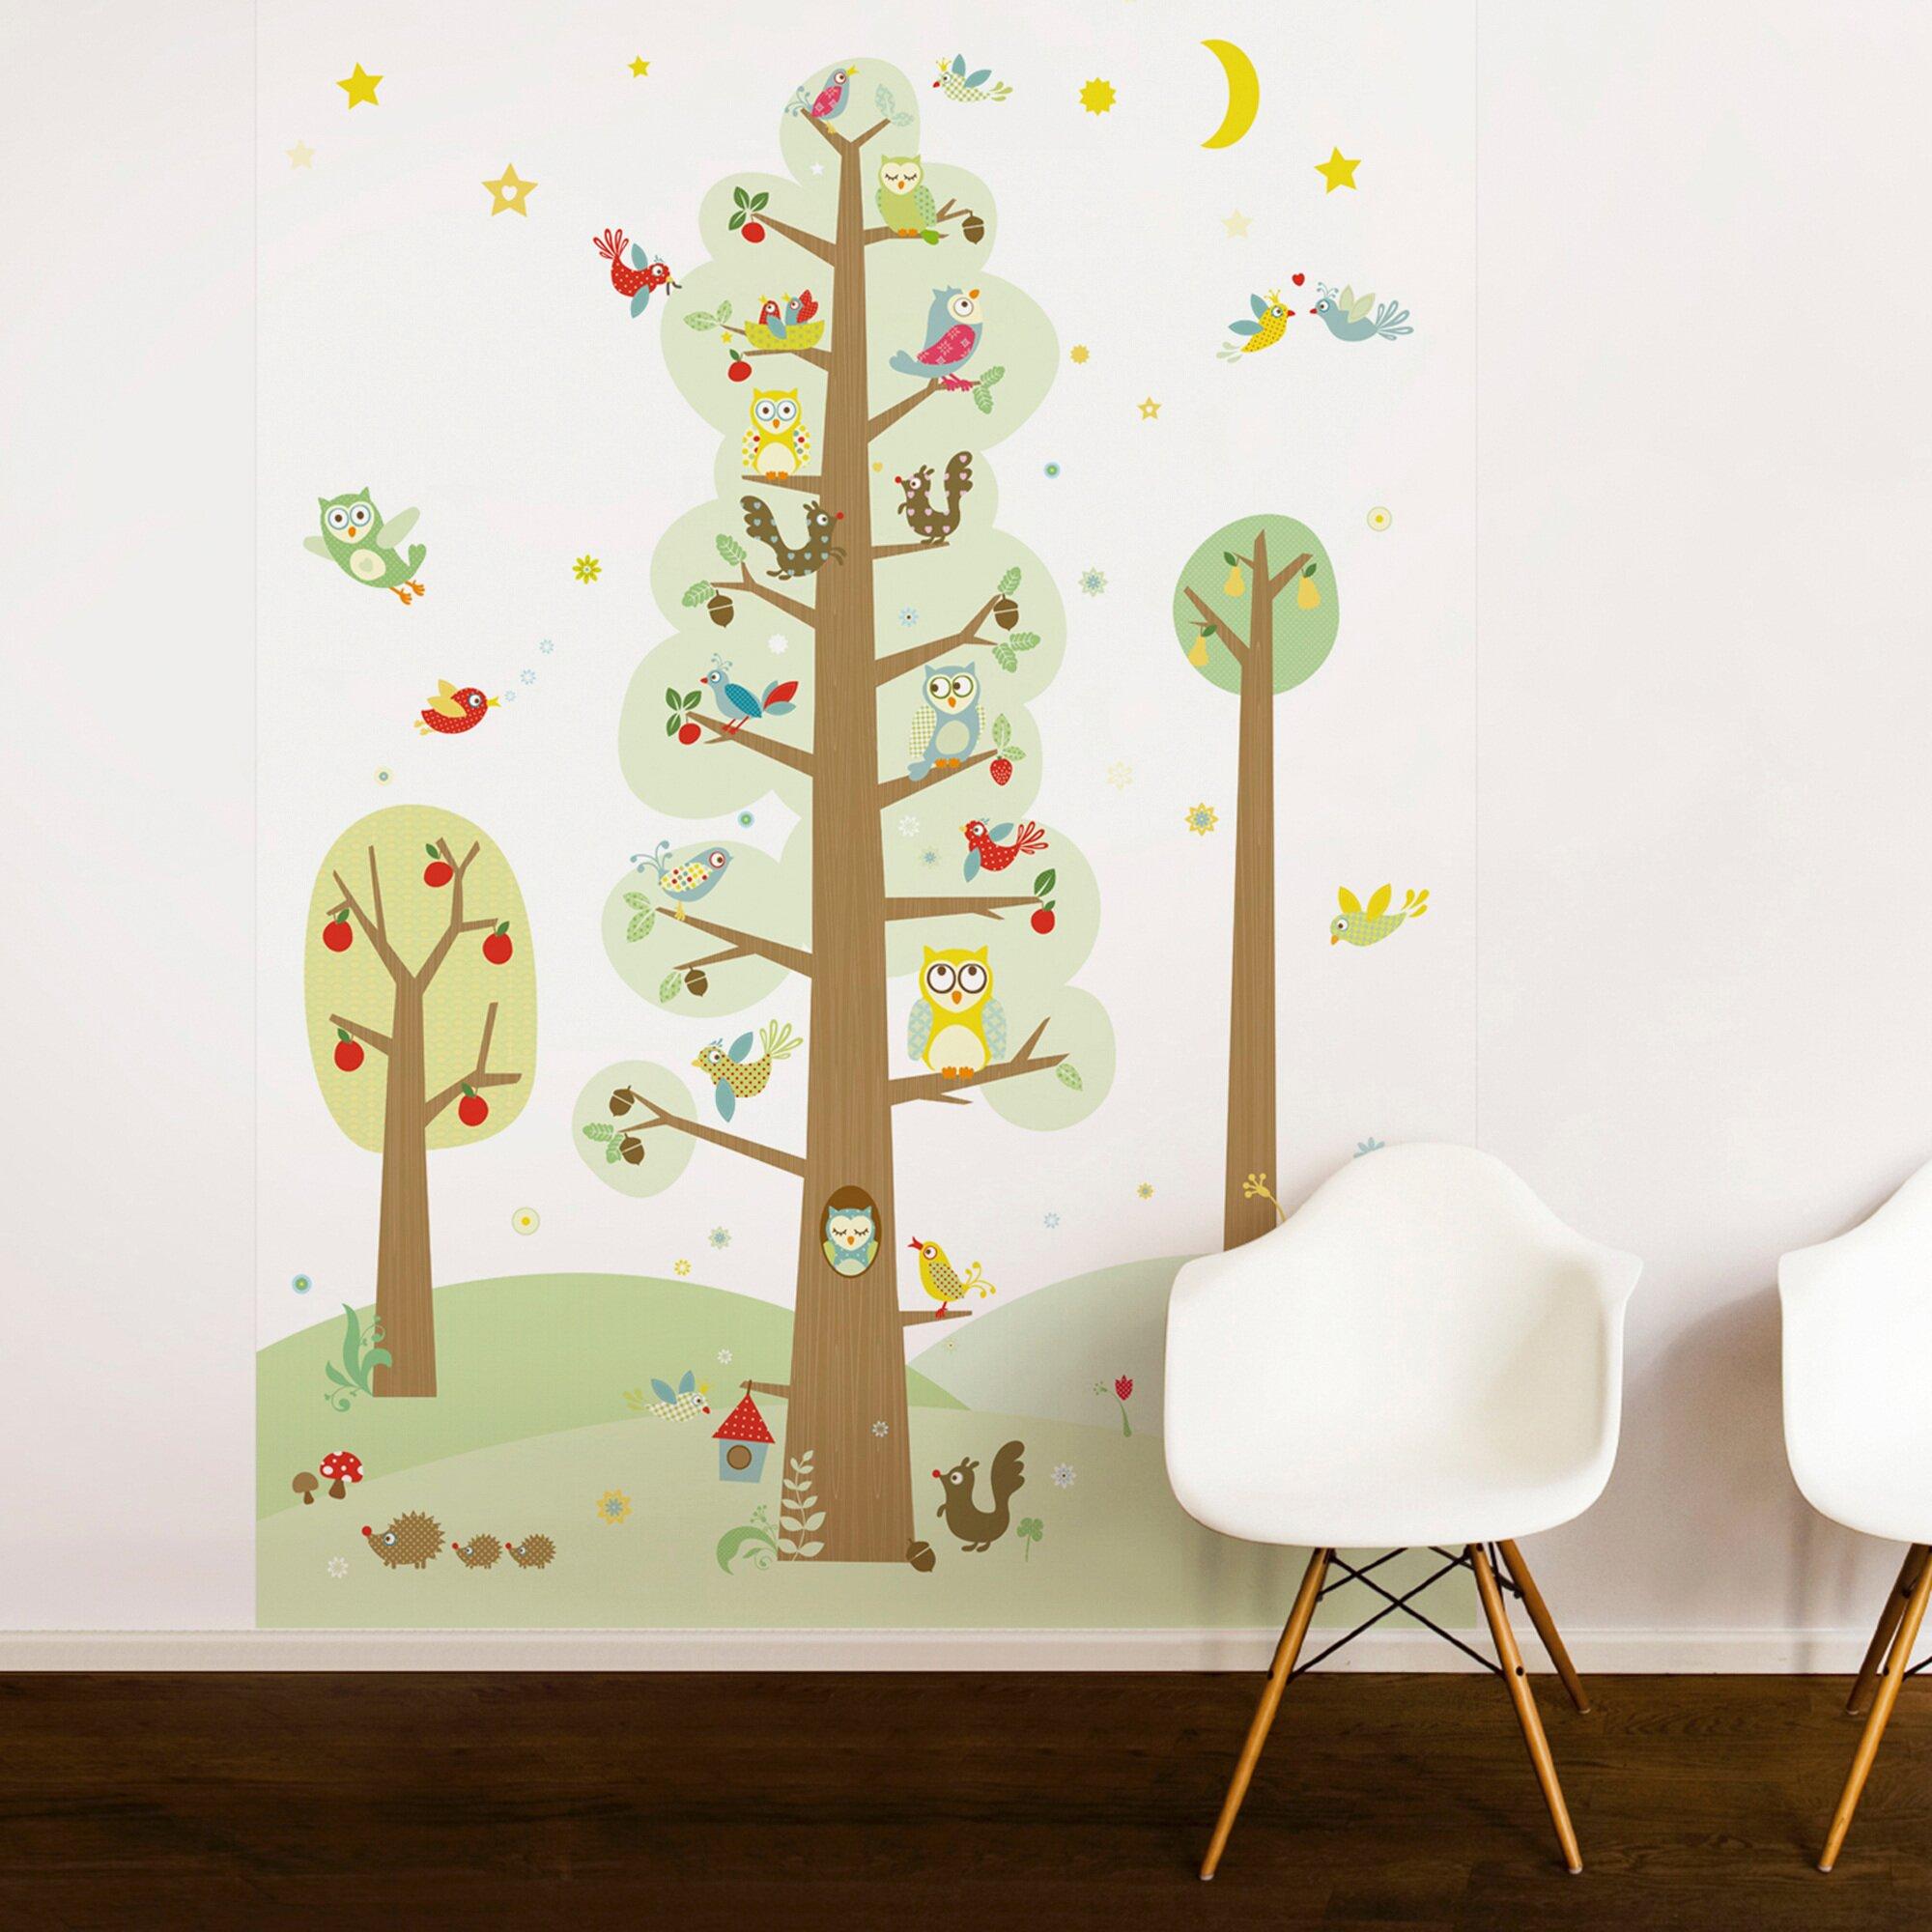 anna-wand-design-tapetenwandbild-funny-forest